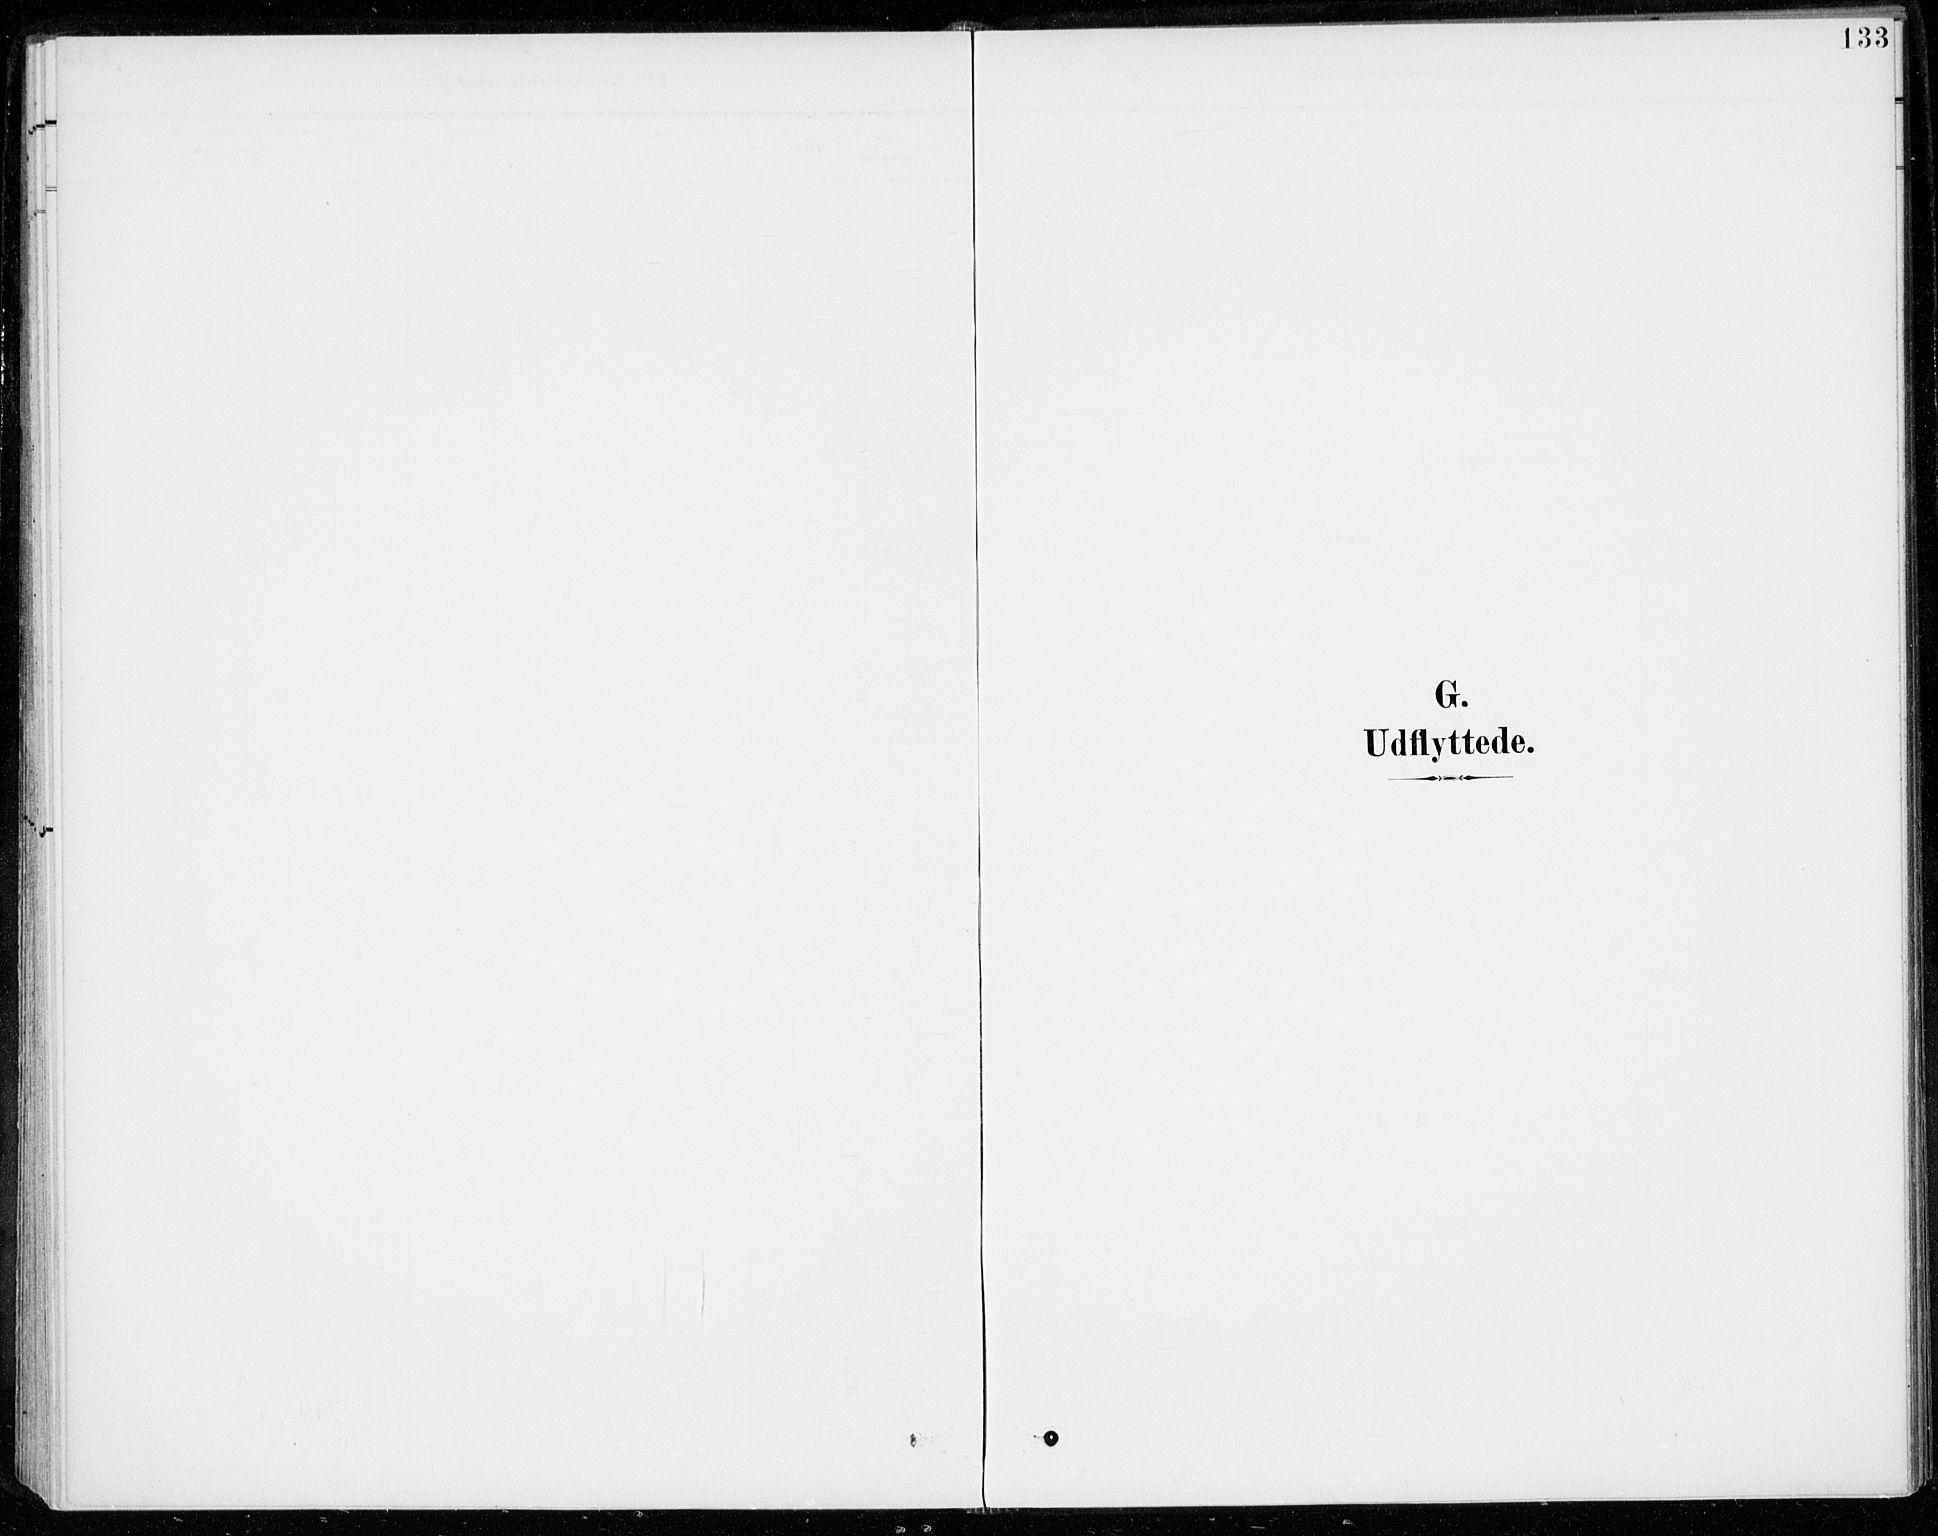 SAKO, Sigdal kirkebøker, F/Fc/L0002: Ministerialbok nr. III 2, 1894-1911, s. 133